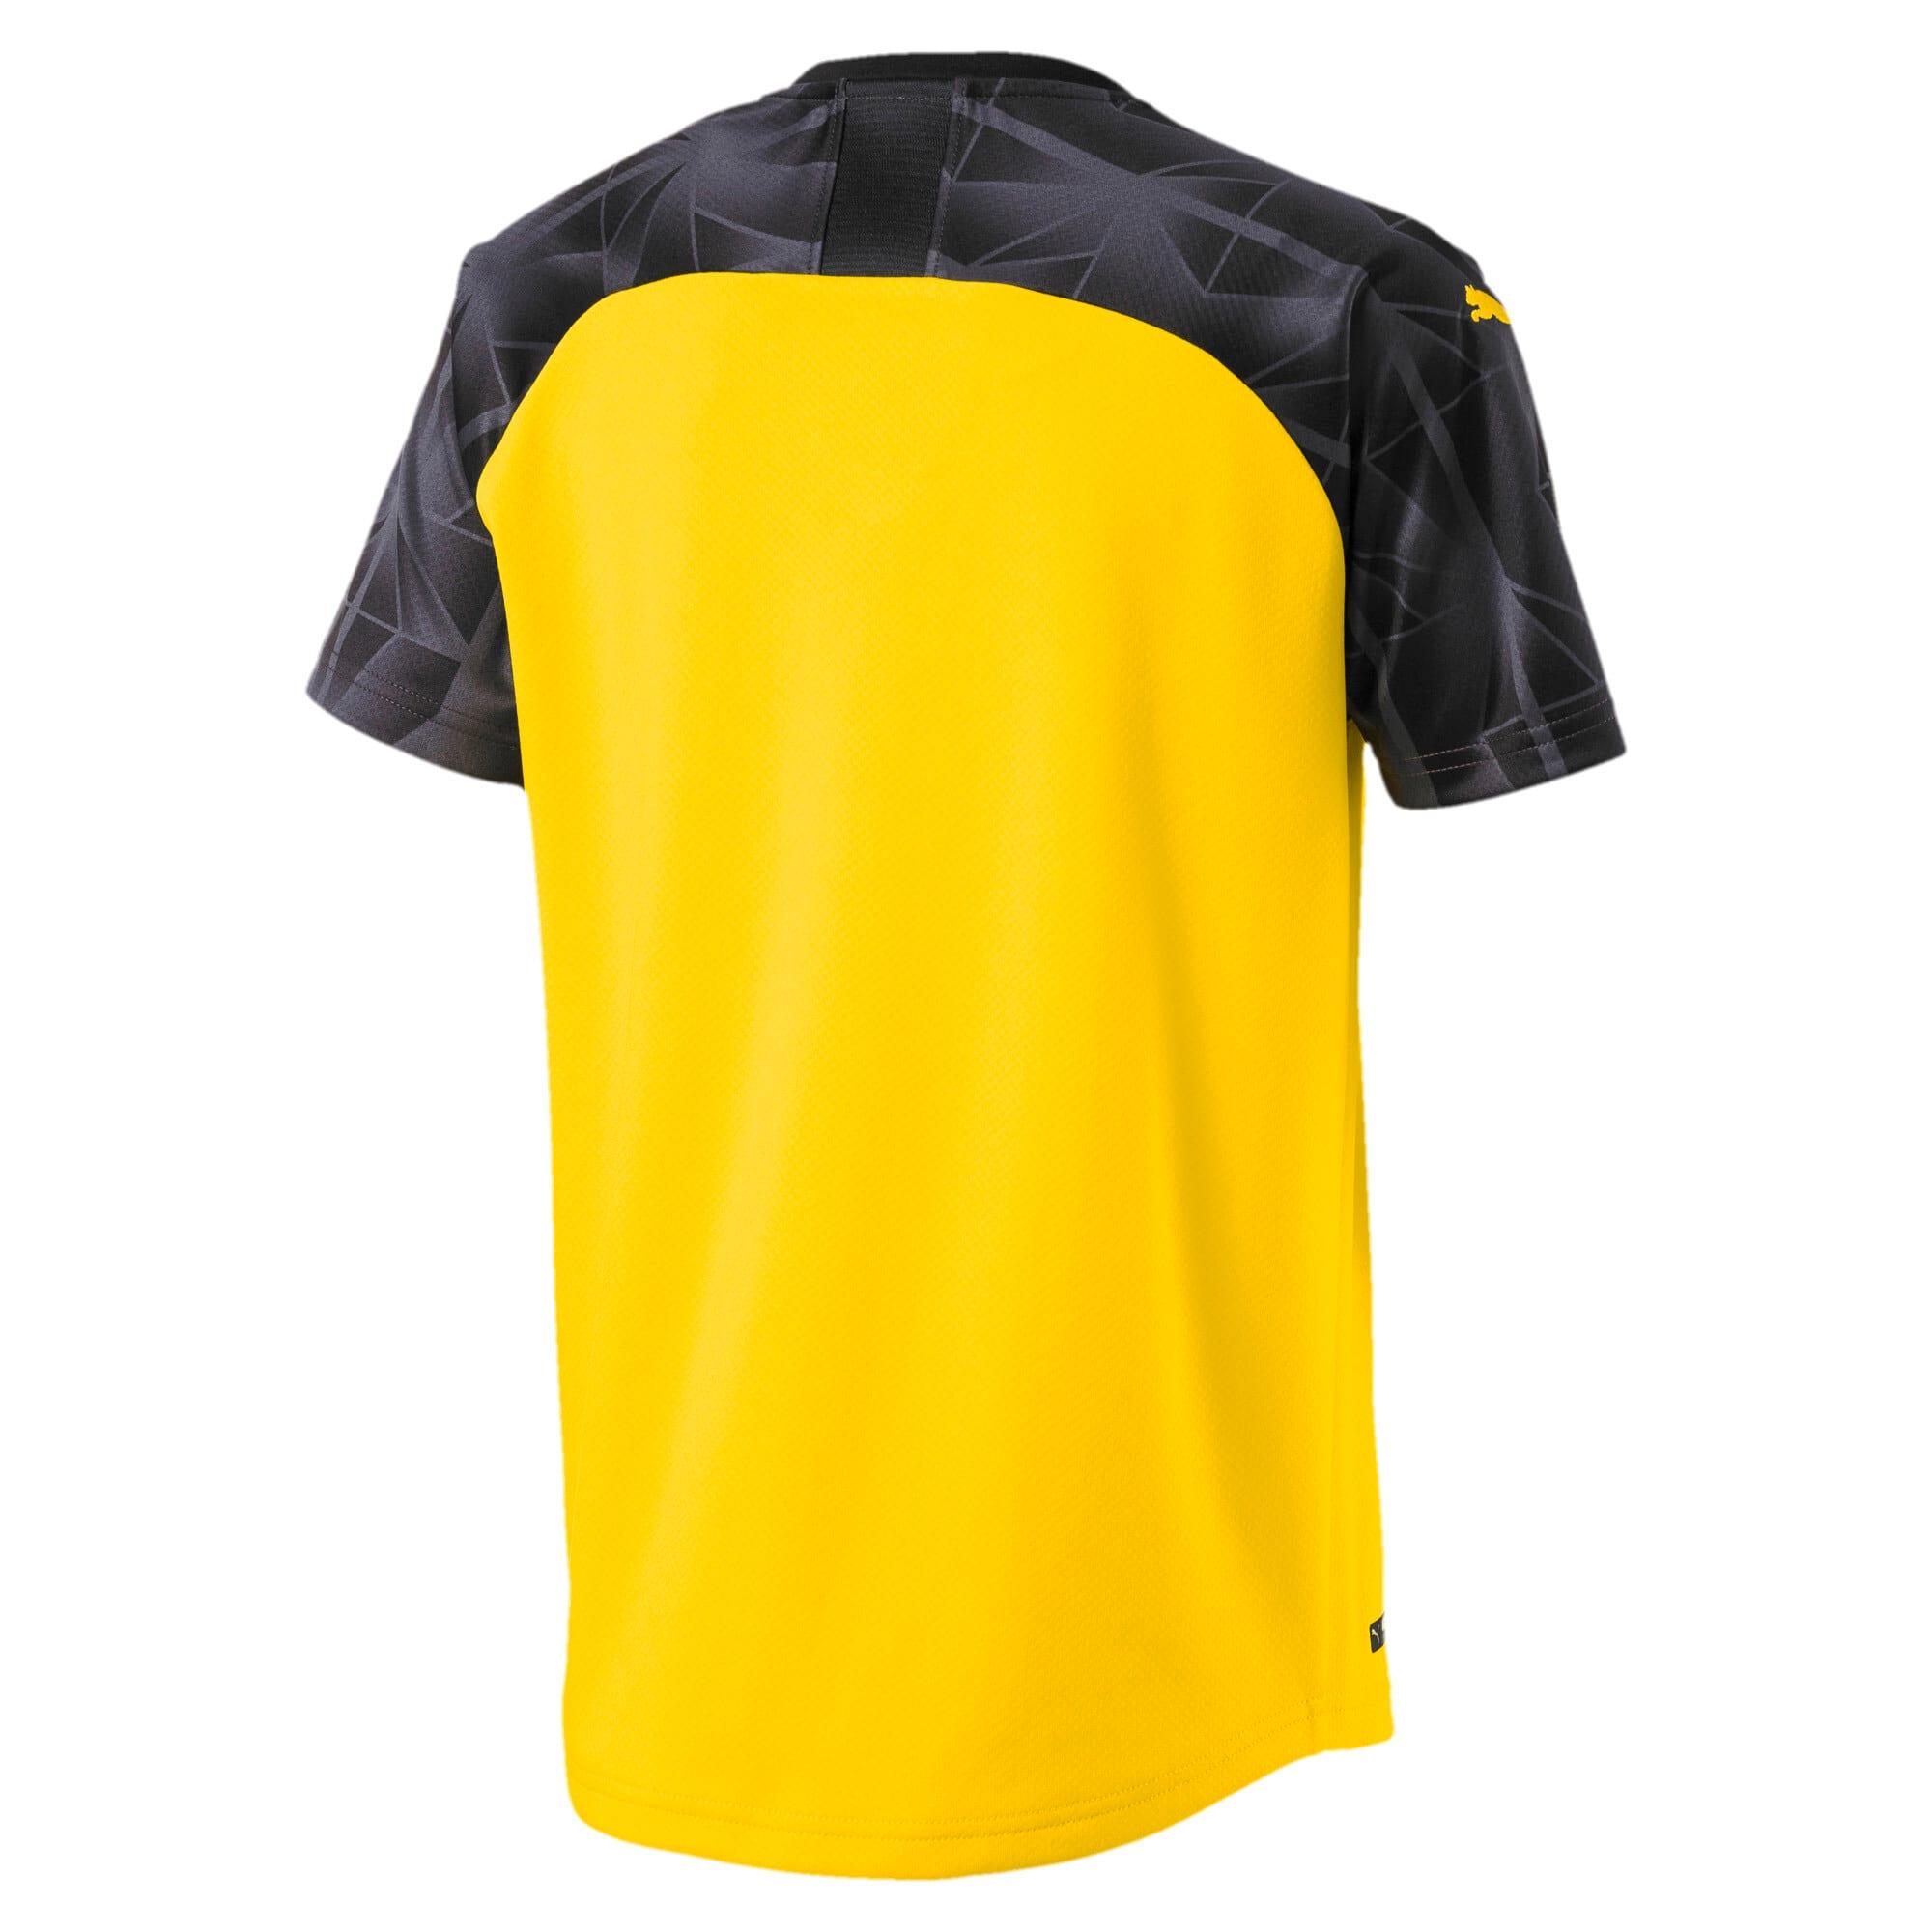 Thumbnail 2 of BVB Cup Boys' Replica Jersey, Cyber Yellow-Puma Black, medium